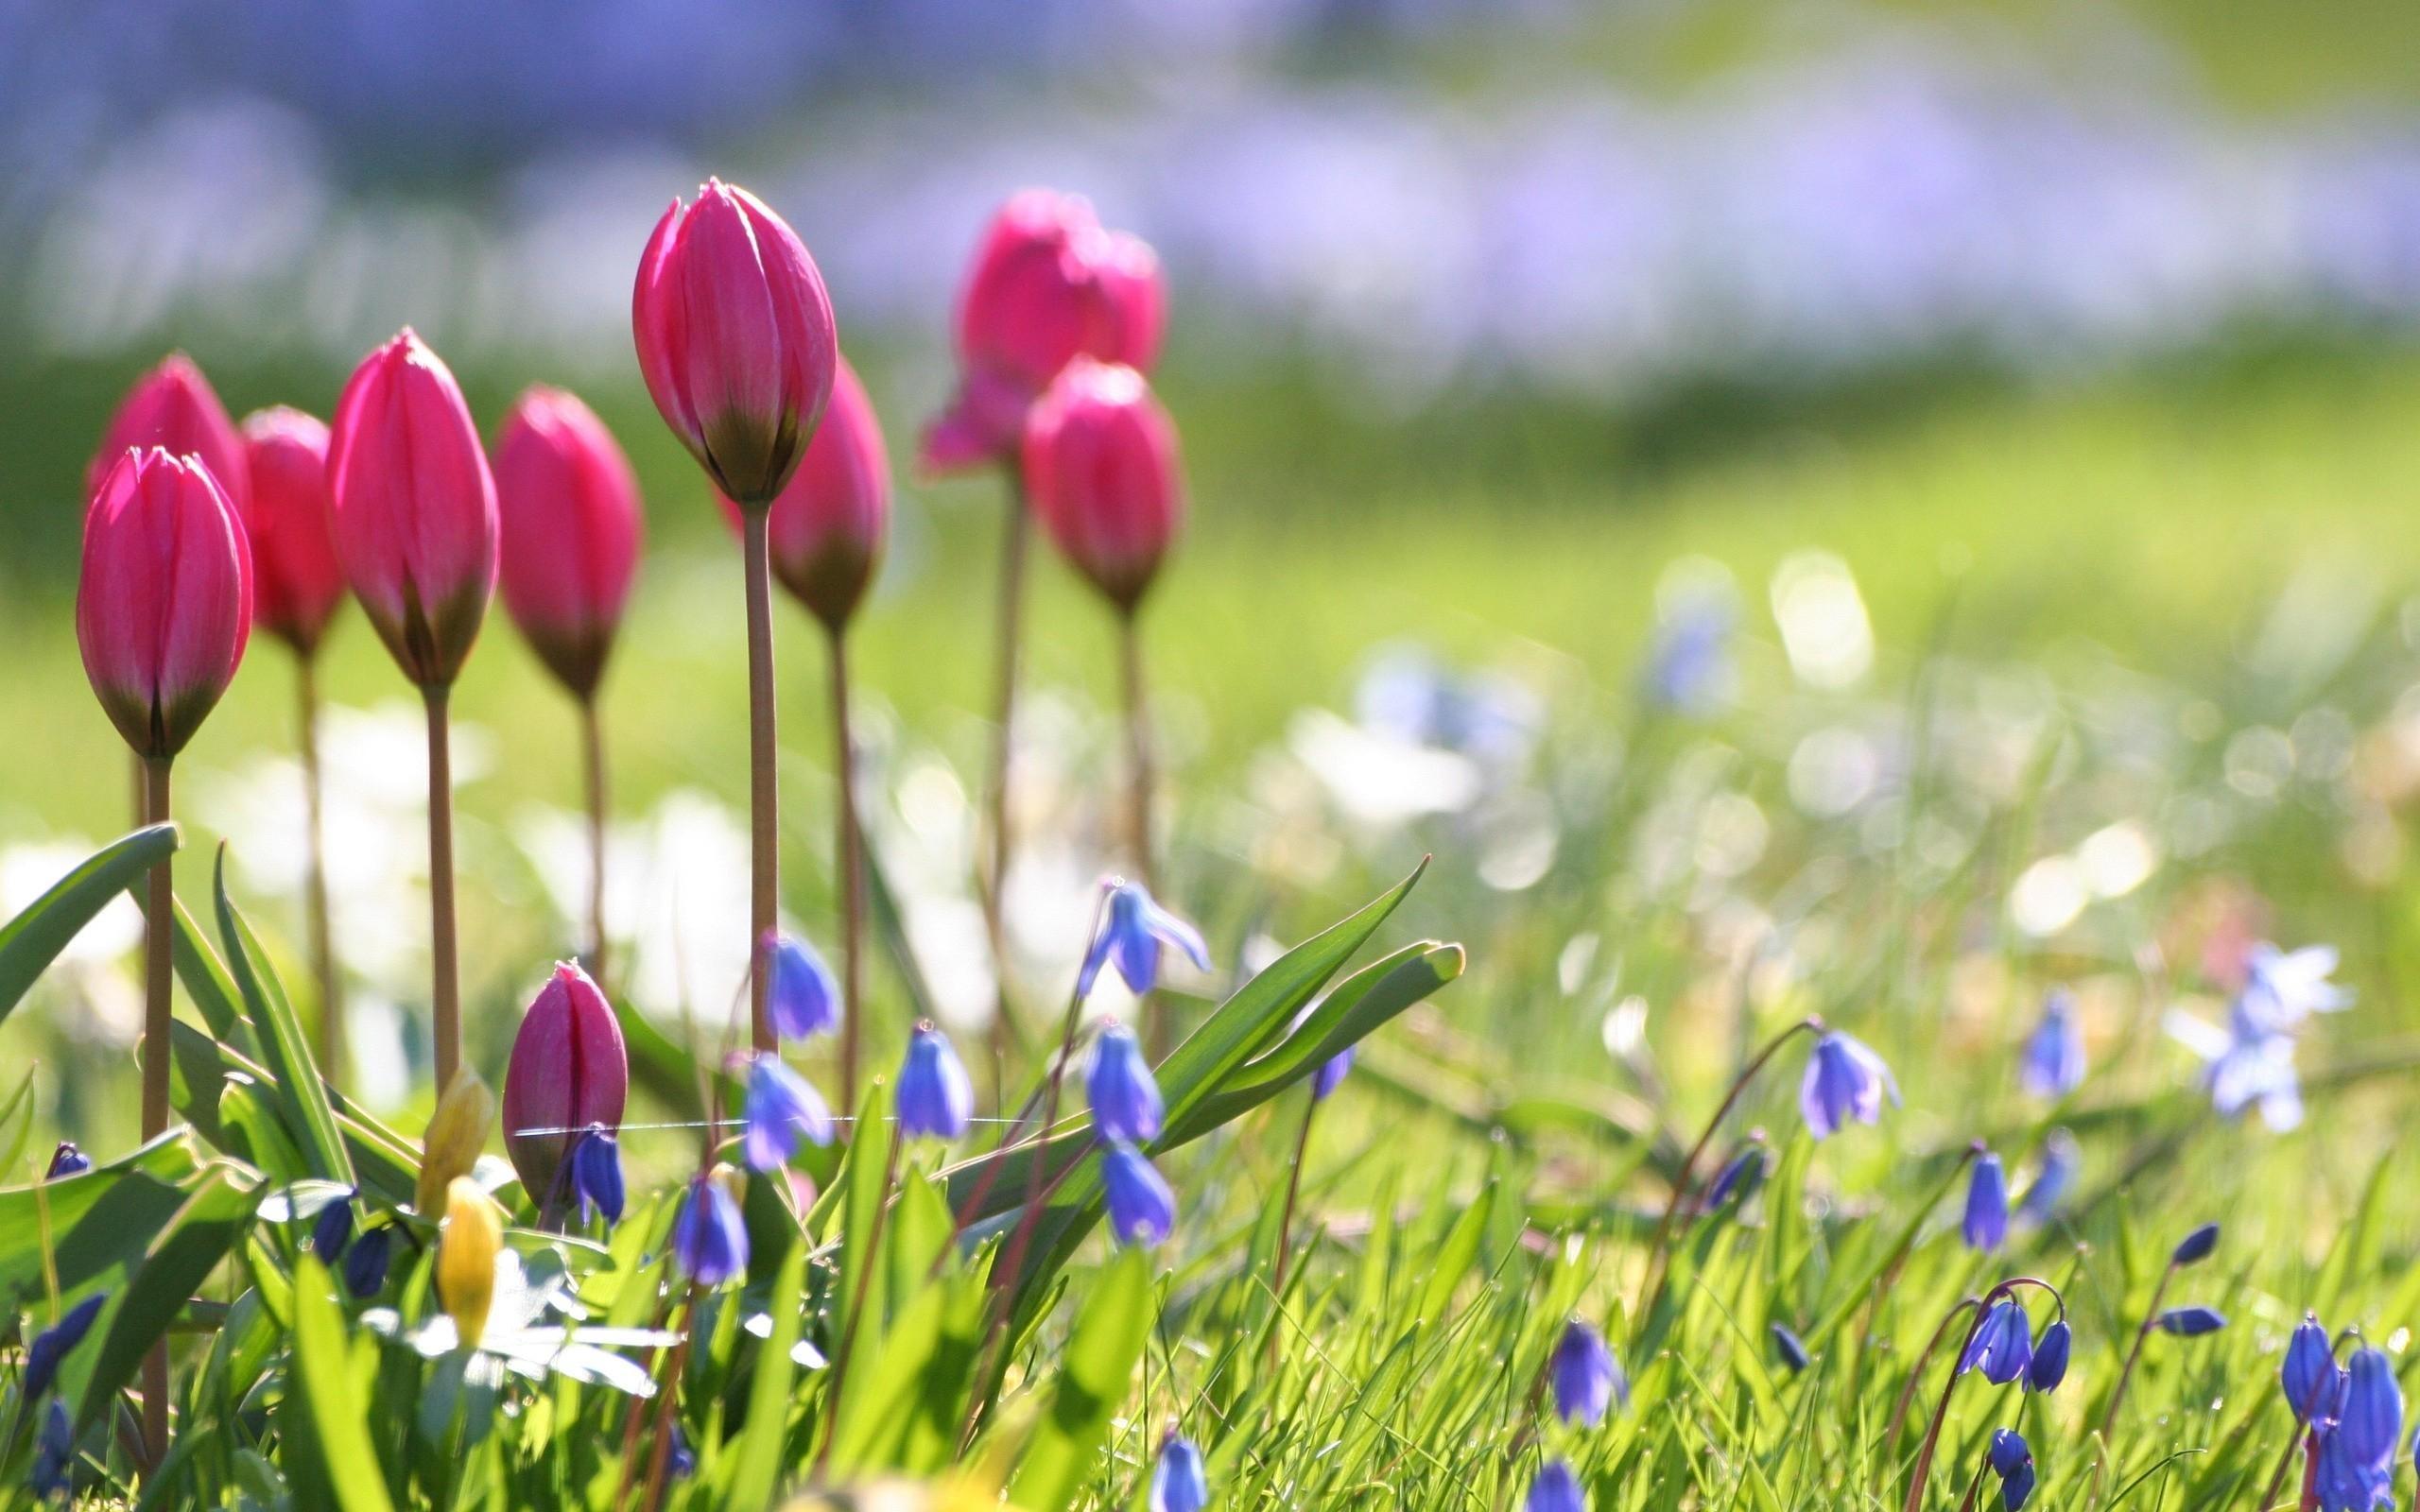 beautiful nature spring flower wallpaper. - media file | pixelstalk